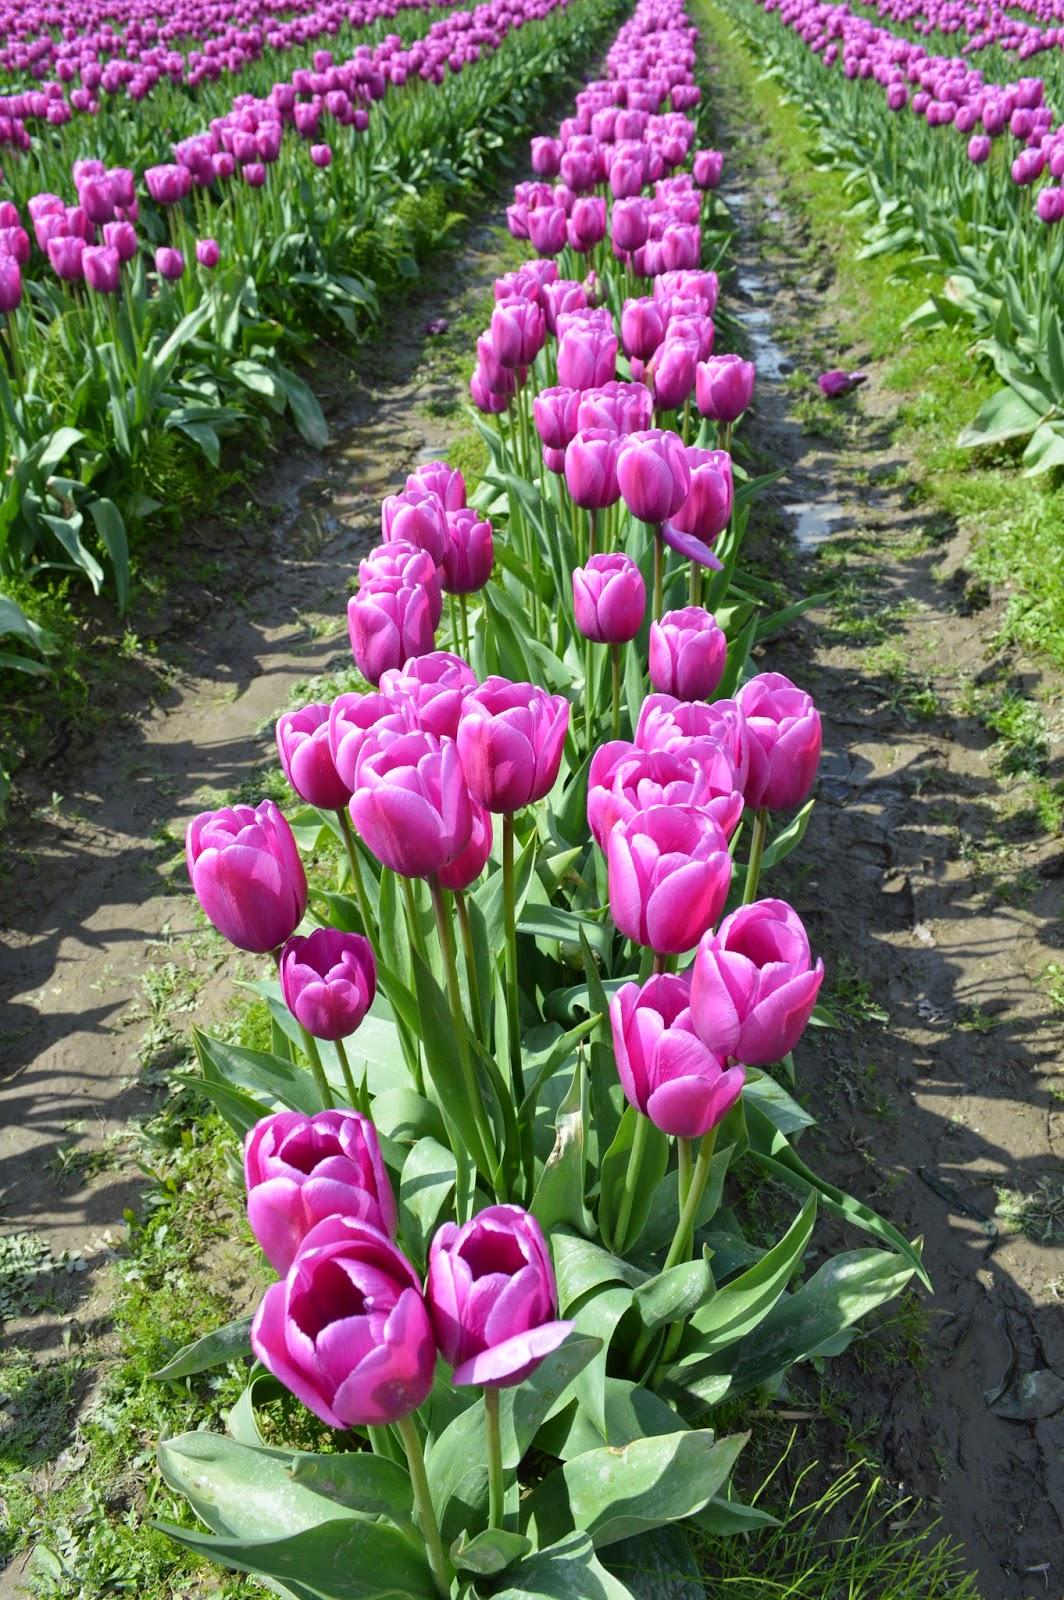 Skagit valley tulips festival. Pink tulips